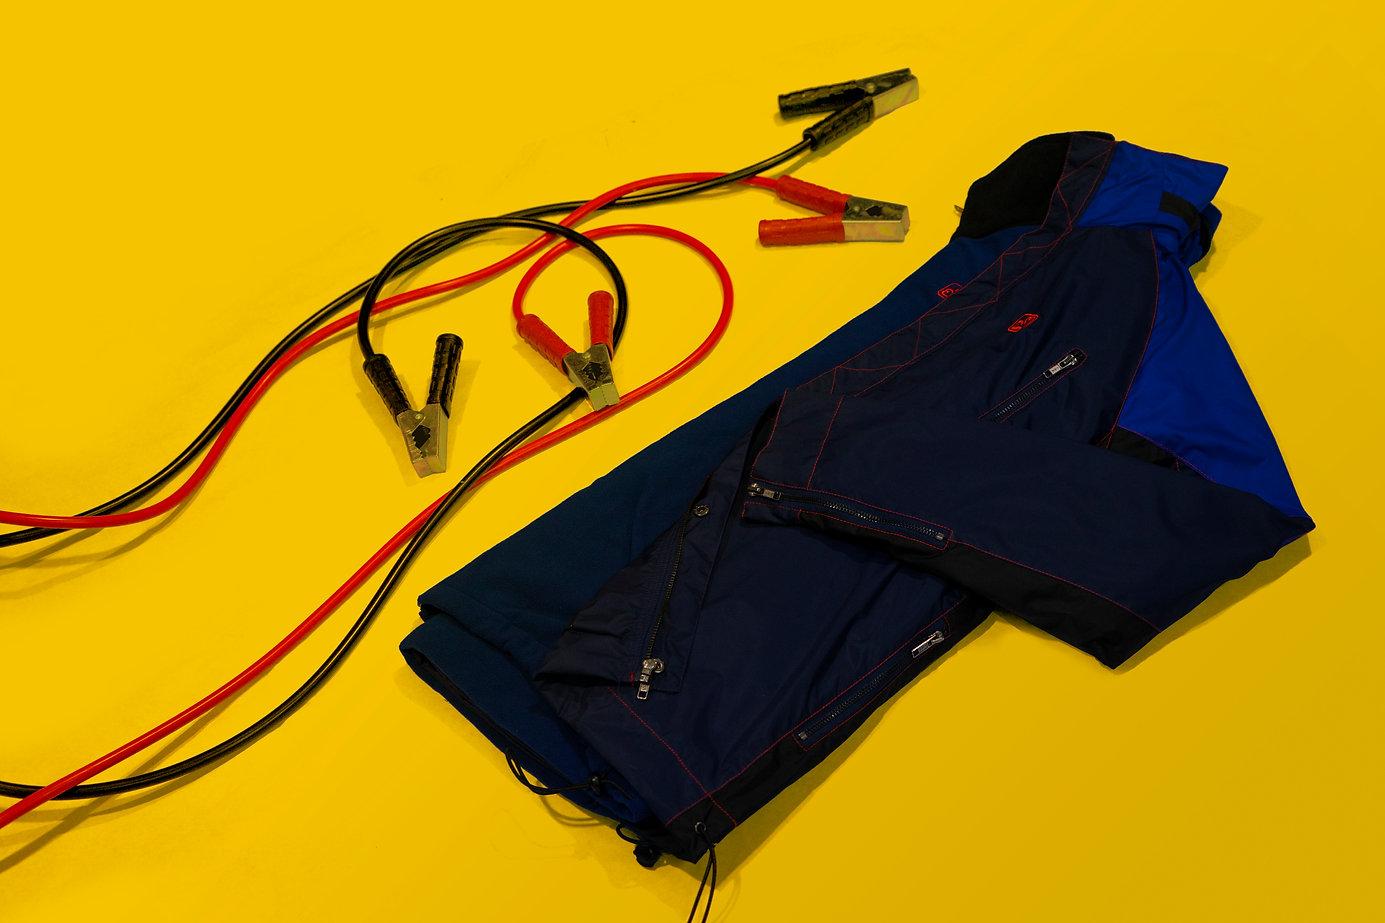 bkhstudio - uniform campaign - ref 8B.jp